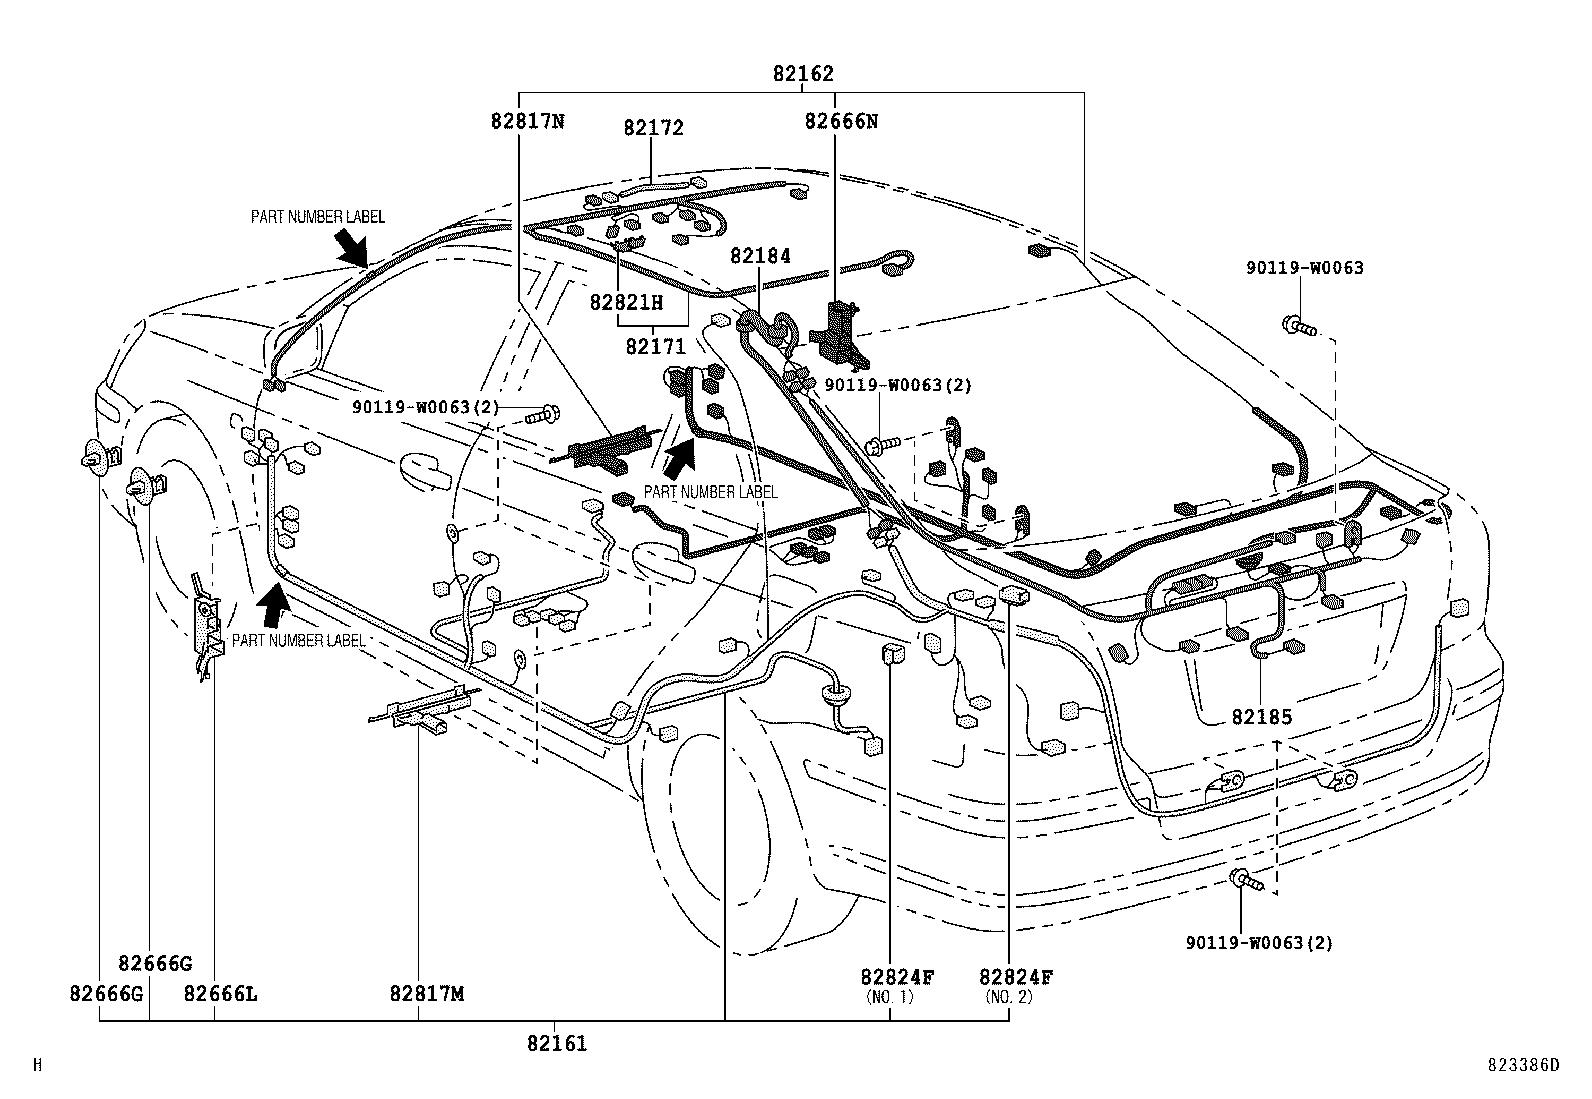 Toyota Avensiscdt250l-almeyw - Electrical